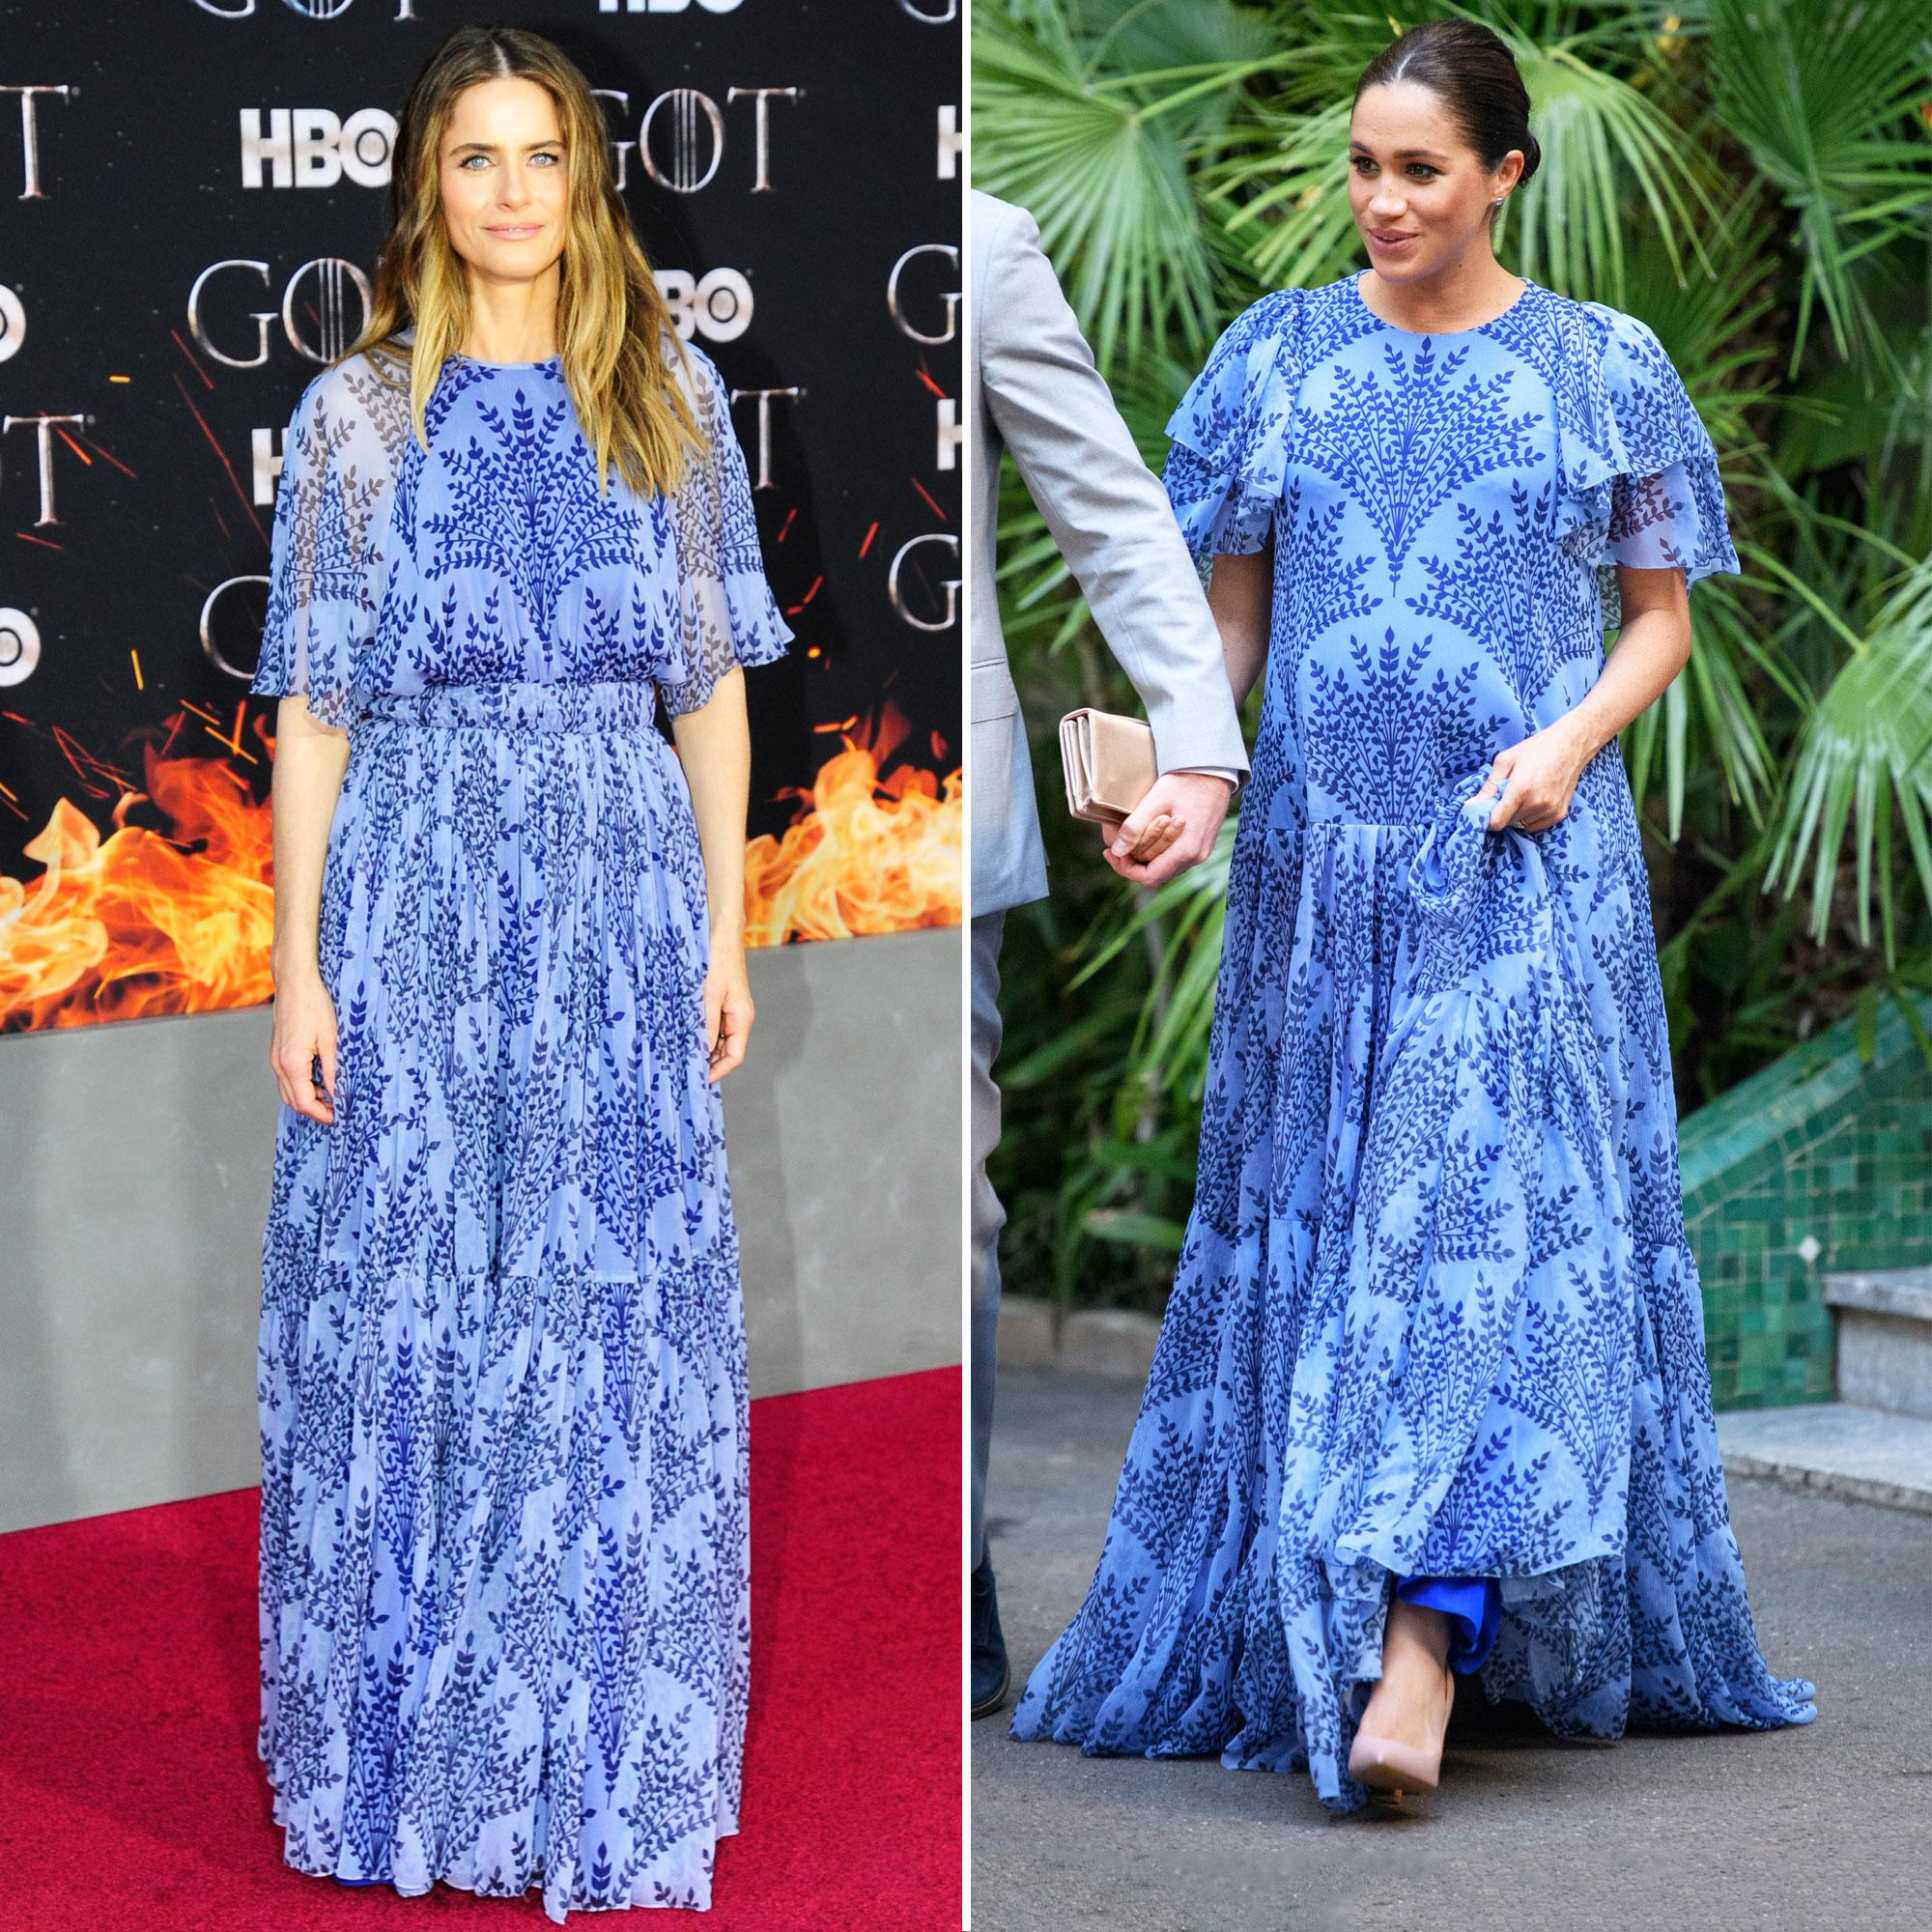 Who Wore the Carolina Herrera Dress Best: Amanda Peet or Duchess Meghan?